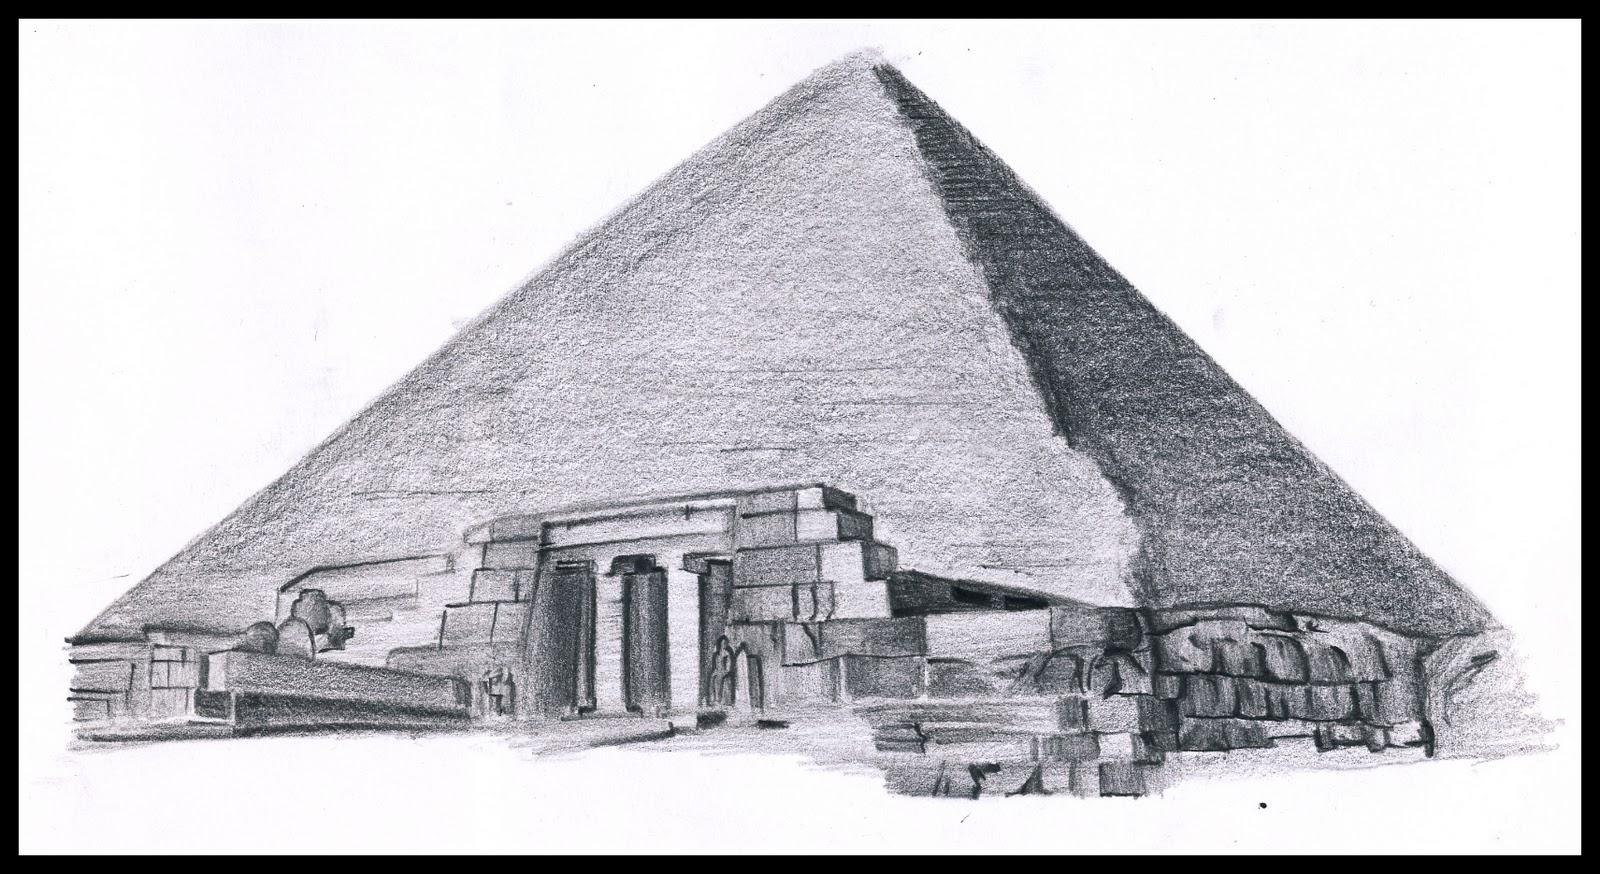 Drawn pyramid egyptian architecture : Architecture AHSTARC :) TOMORROW